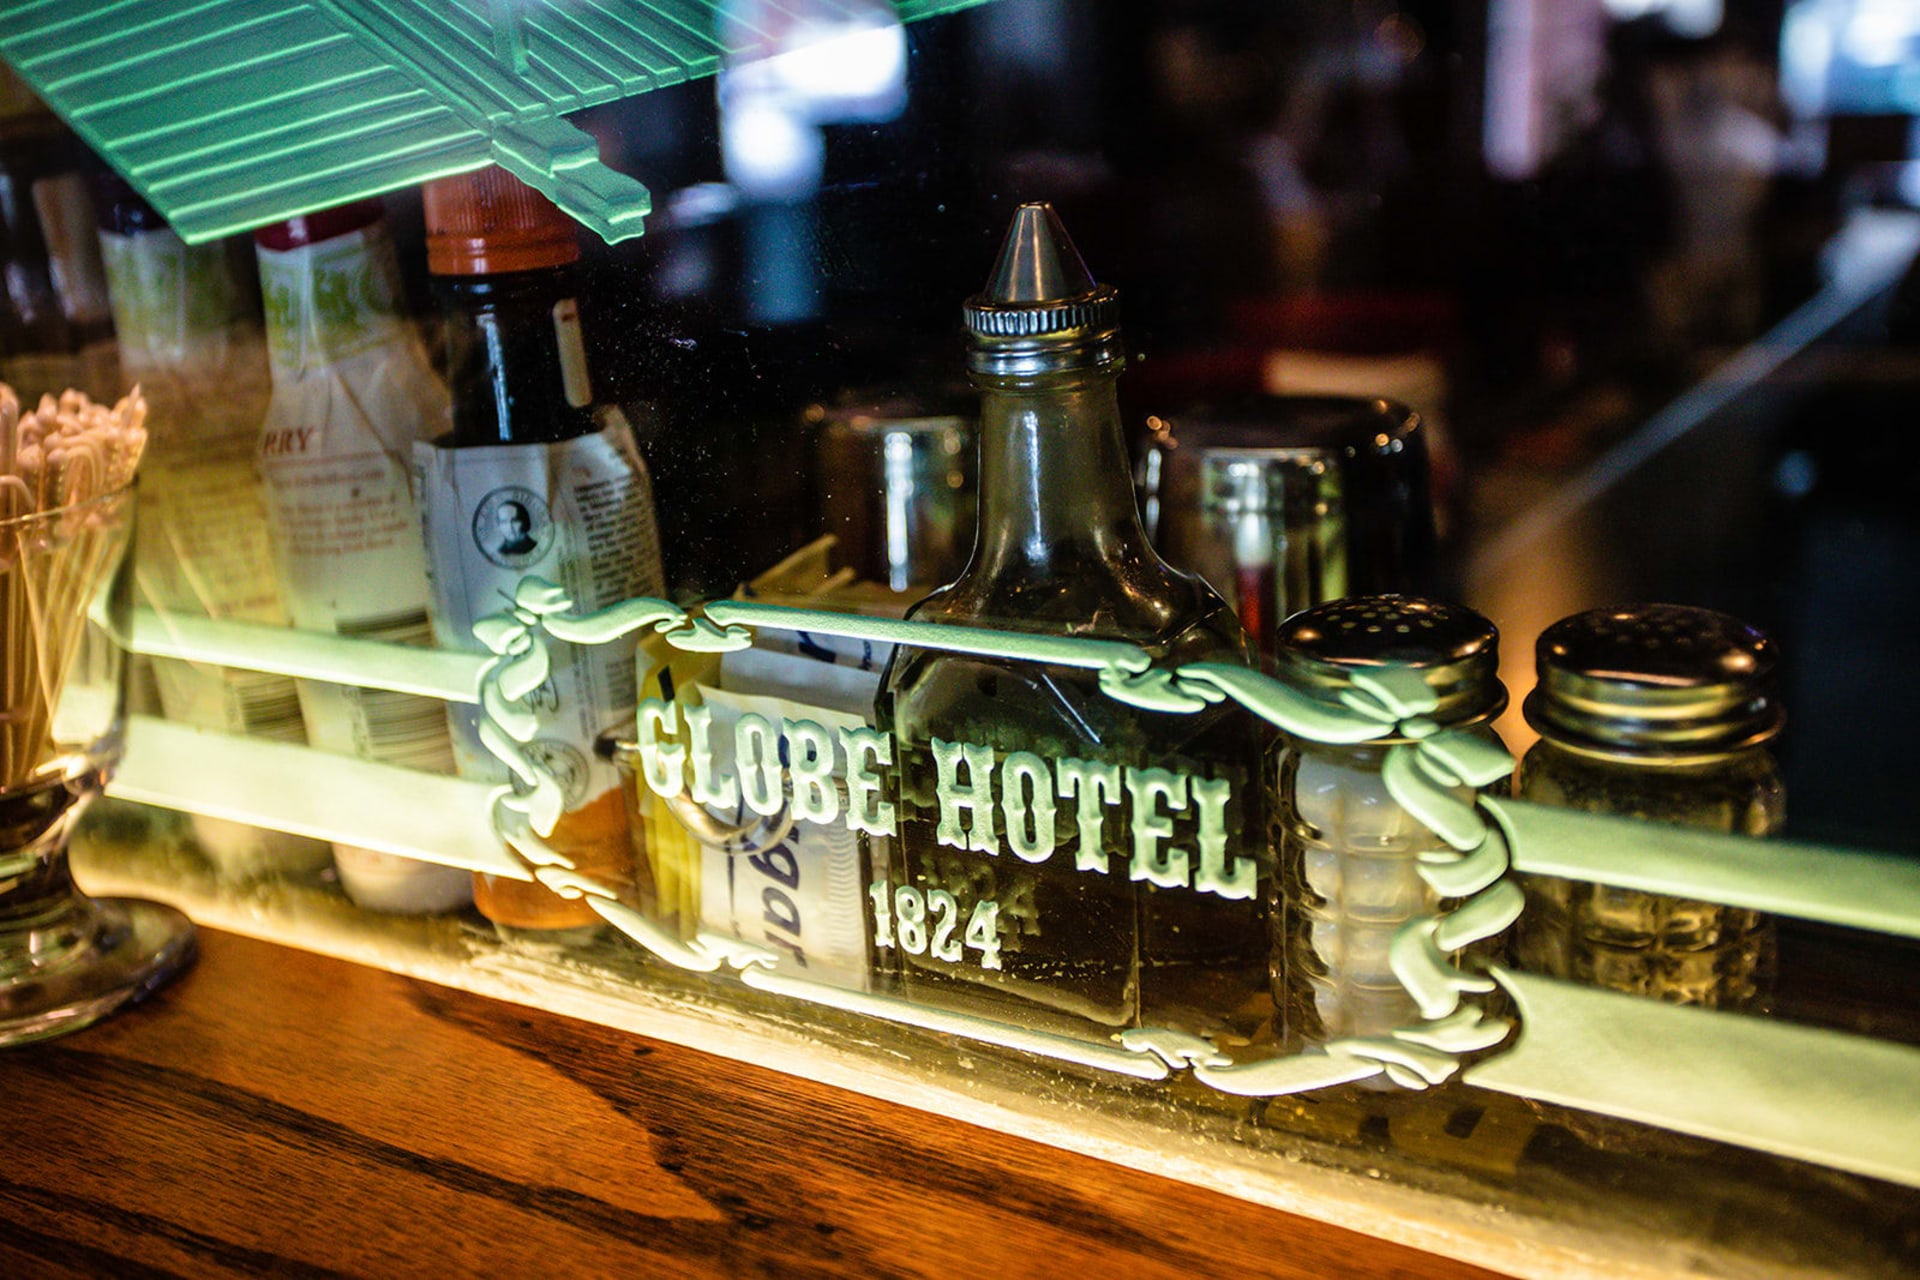 globe hotel window sign